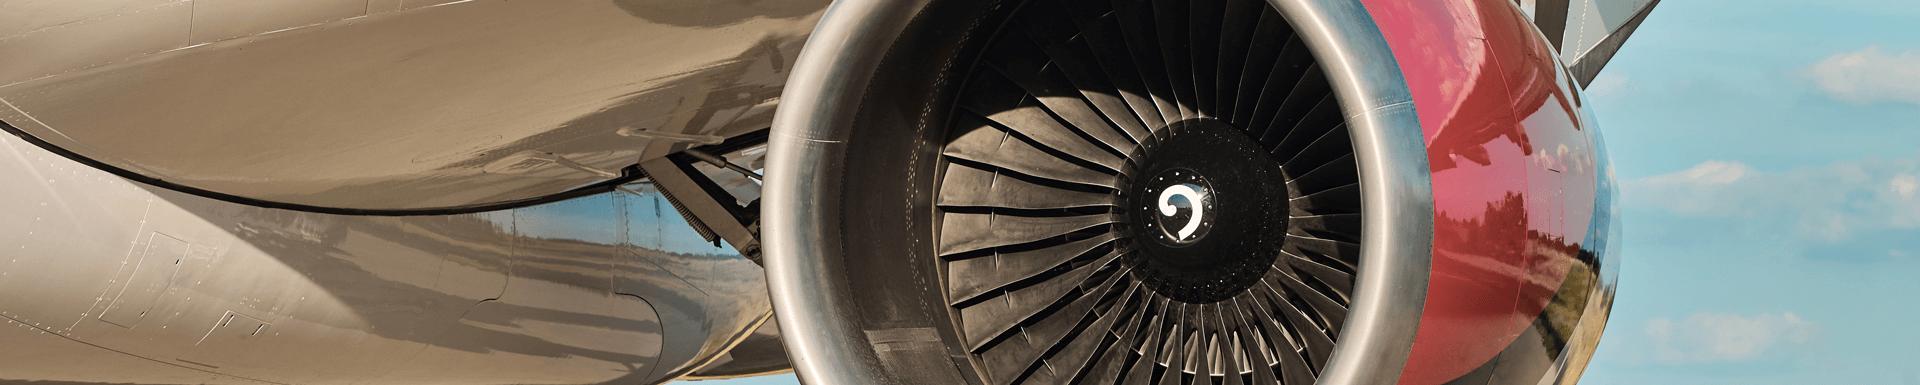 meyer aerospace